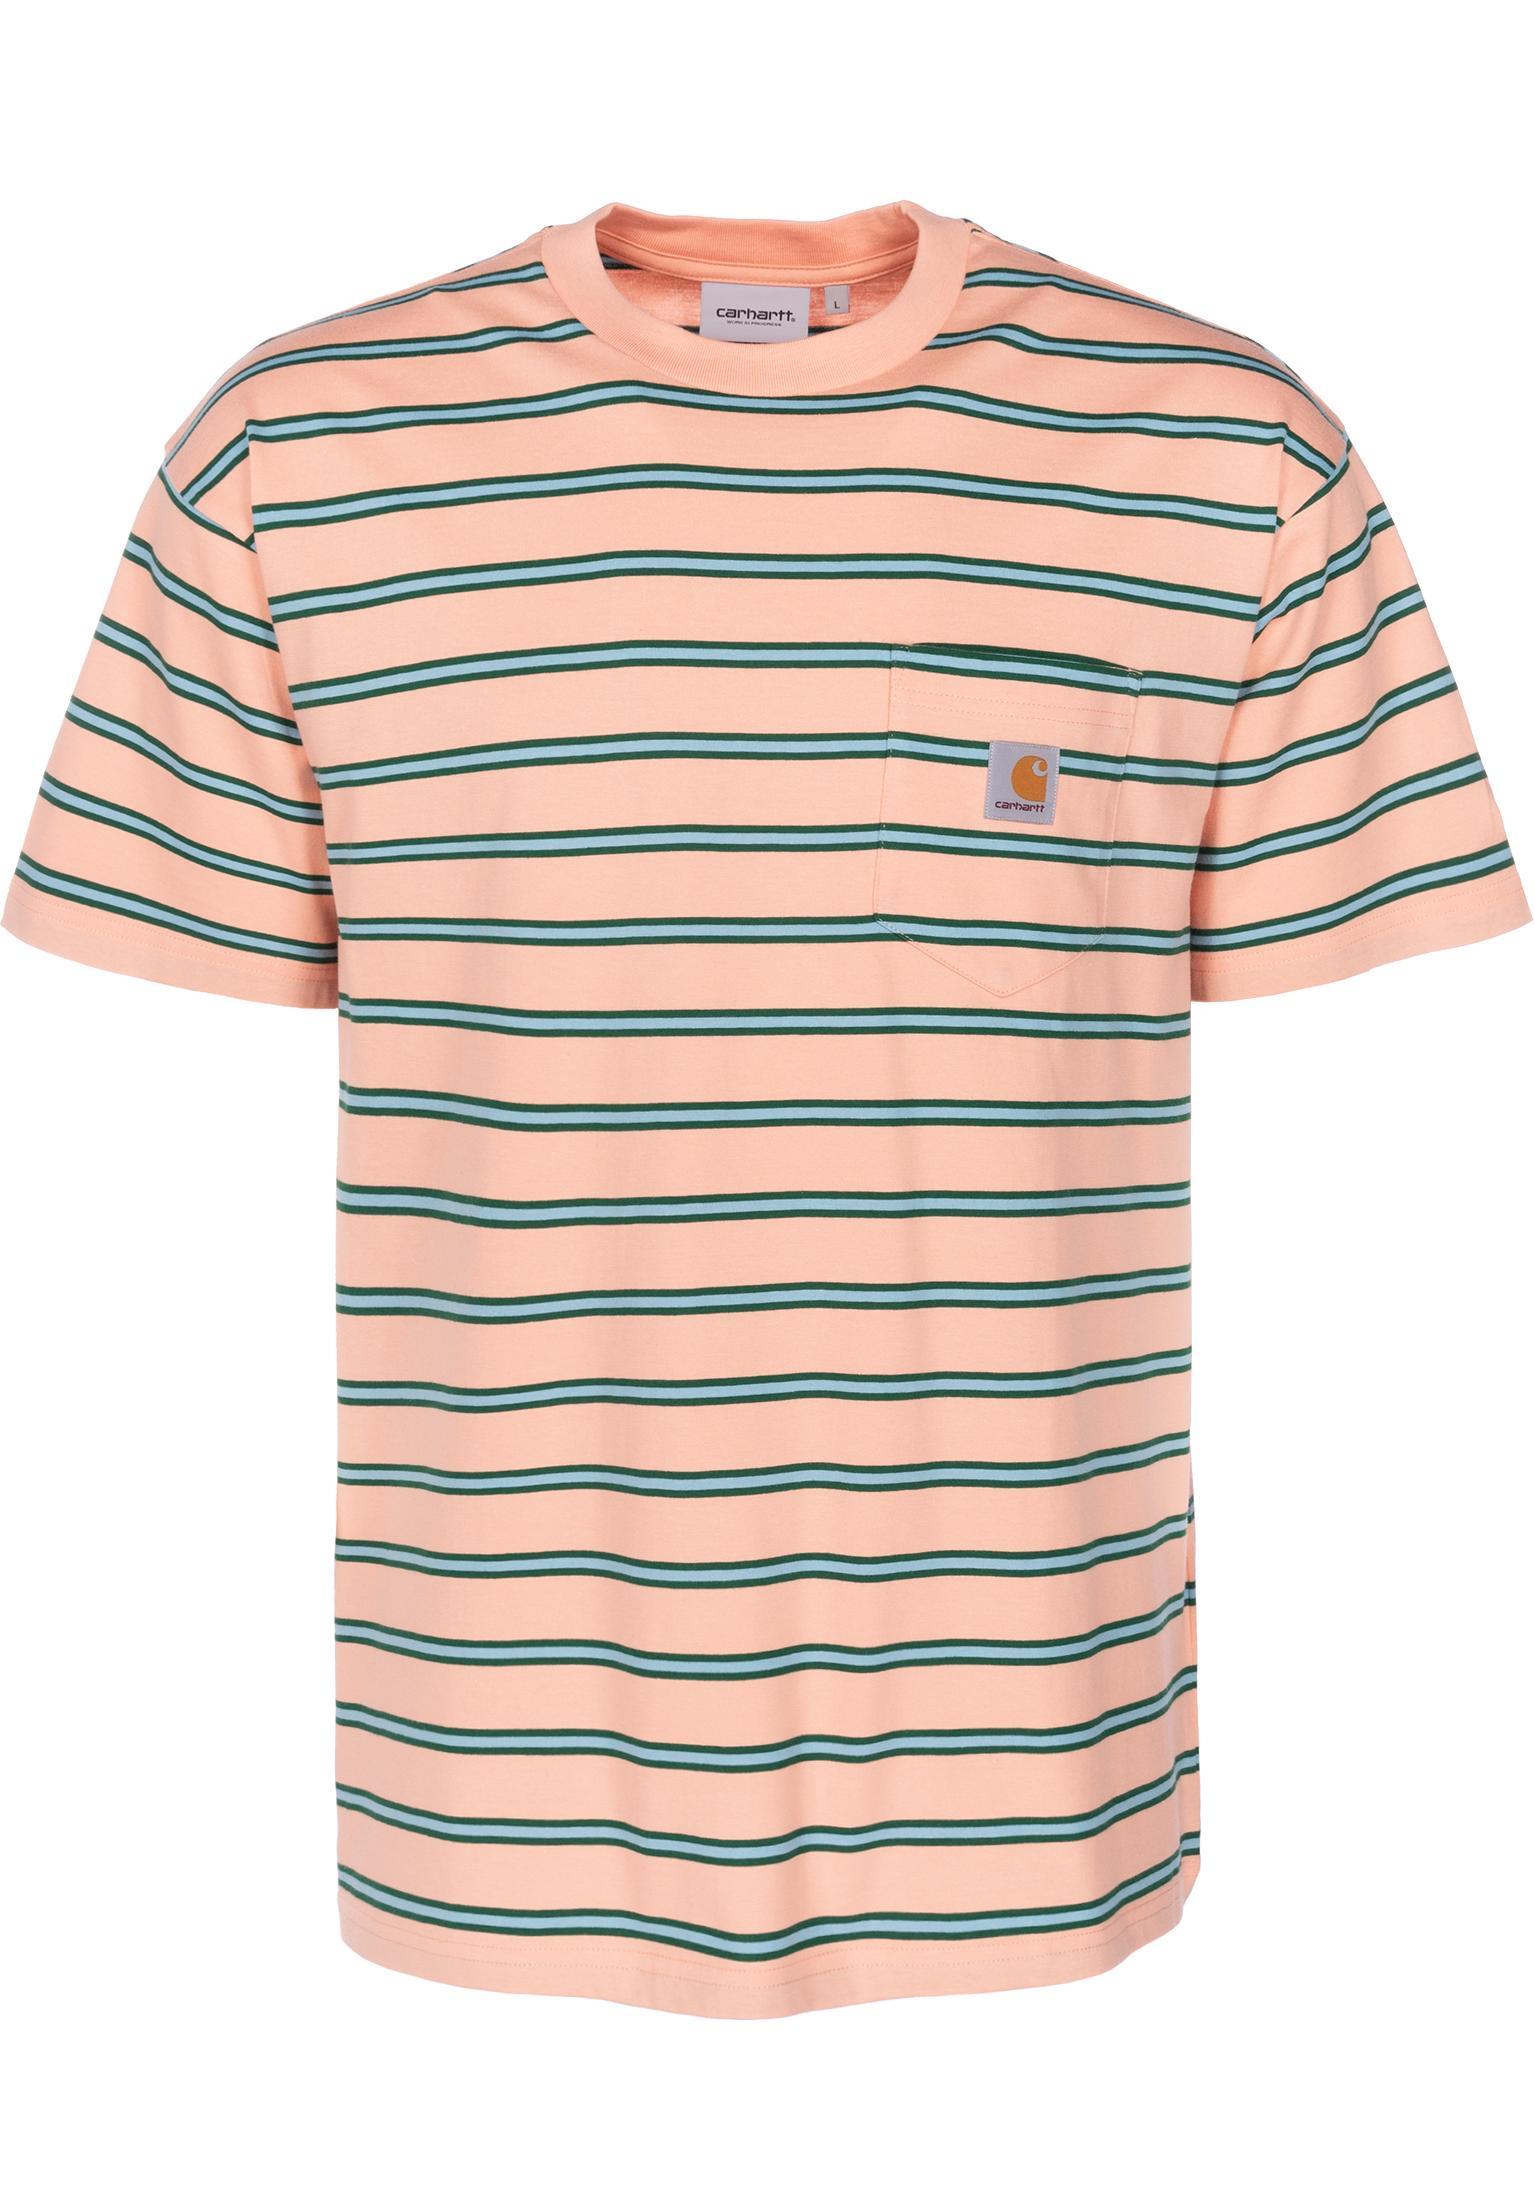 954ffc0b3a13 Houston Pocket Carhartt WIP T-Shirts in houstonstripe-peach for Men ...